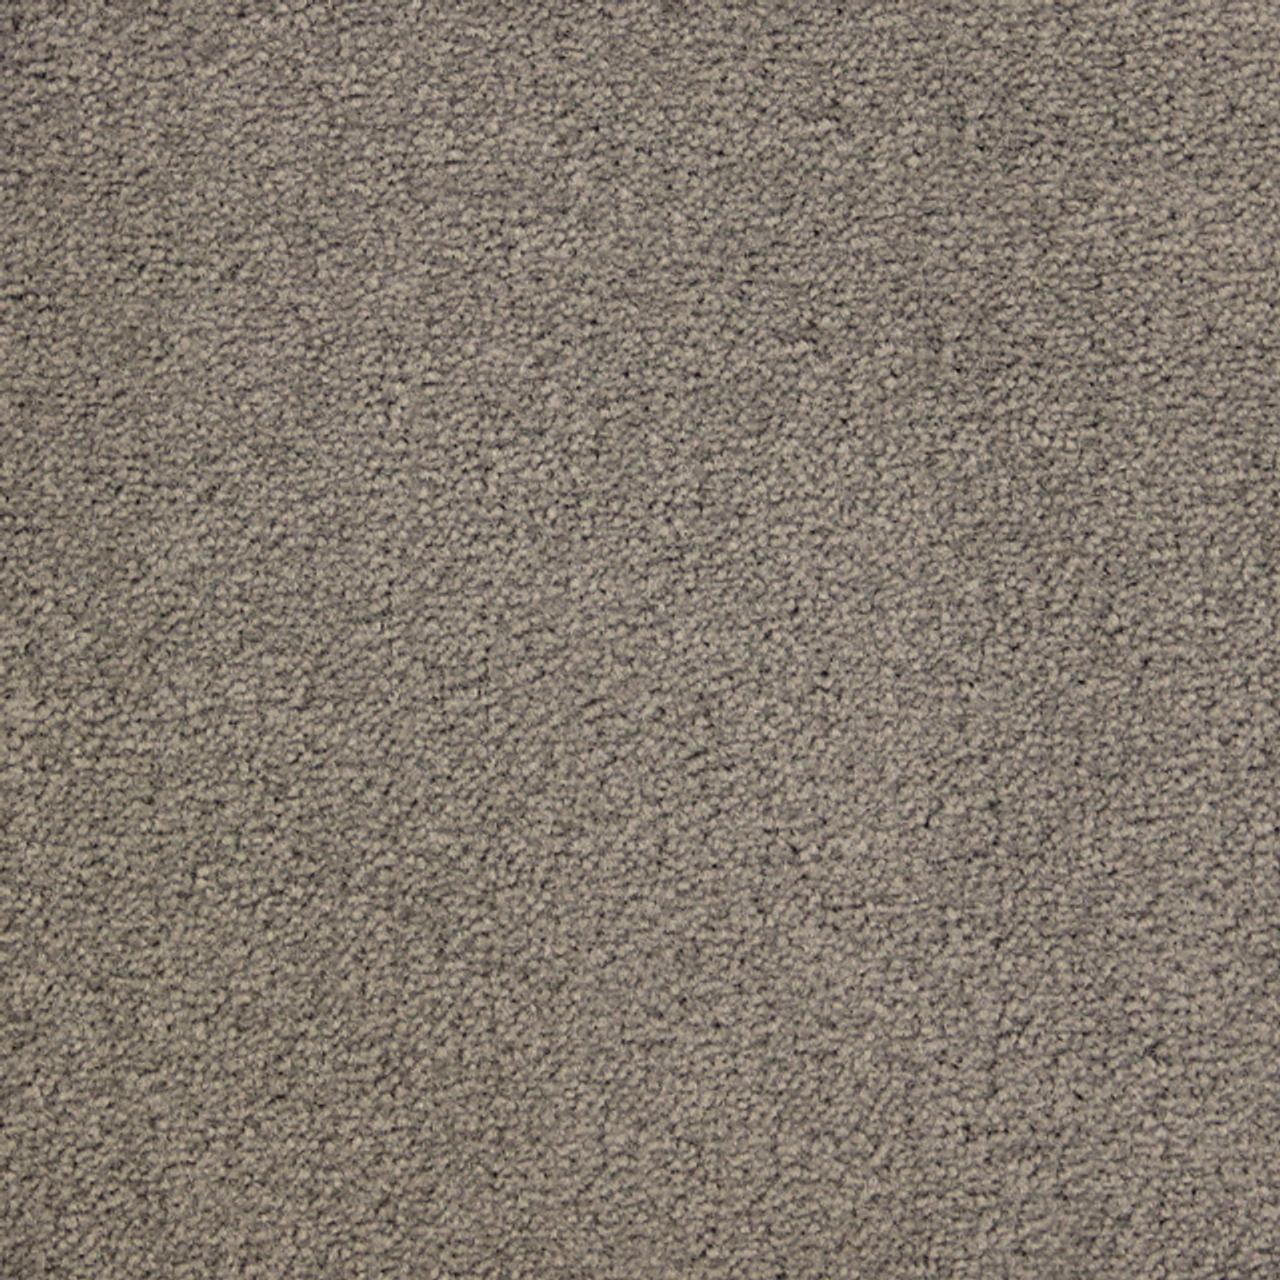 170 - Greystone